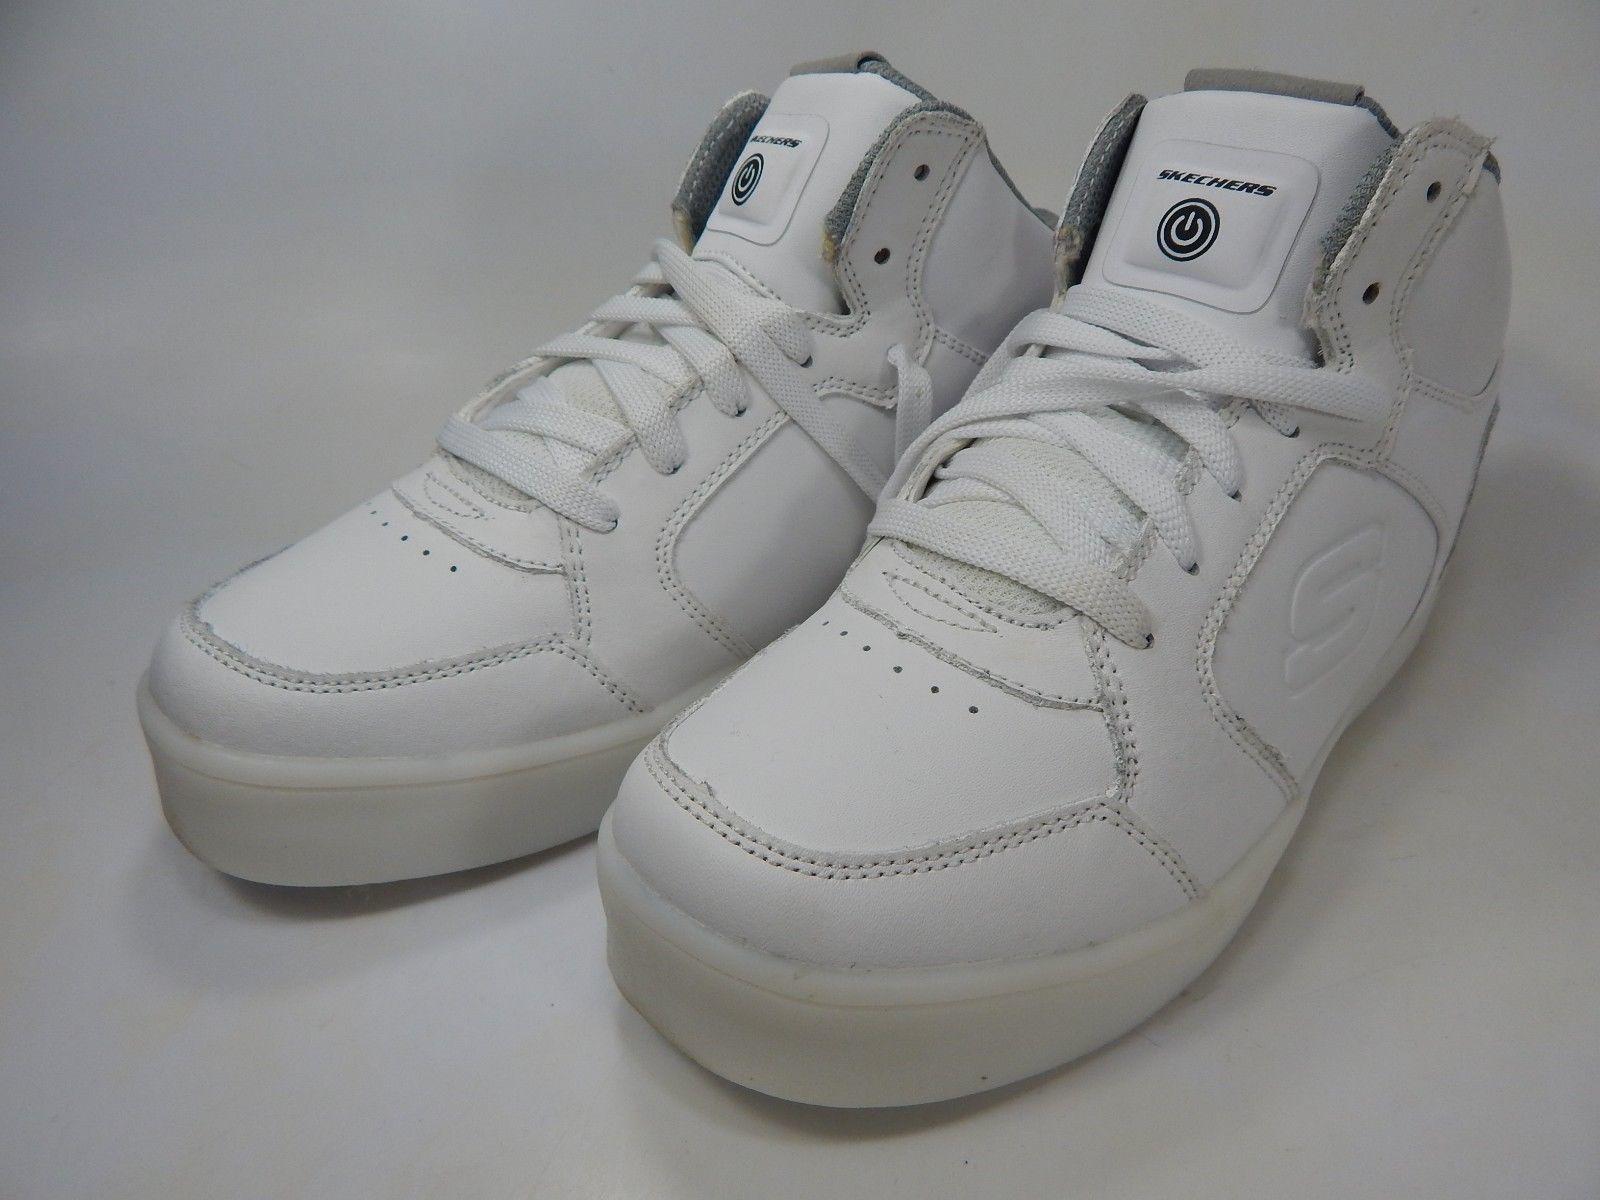 Skechers Boy's Lights Energy Light-Up Size 5 Y EU 37 High-Top Sneaker - White